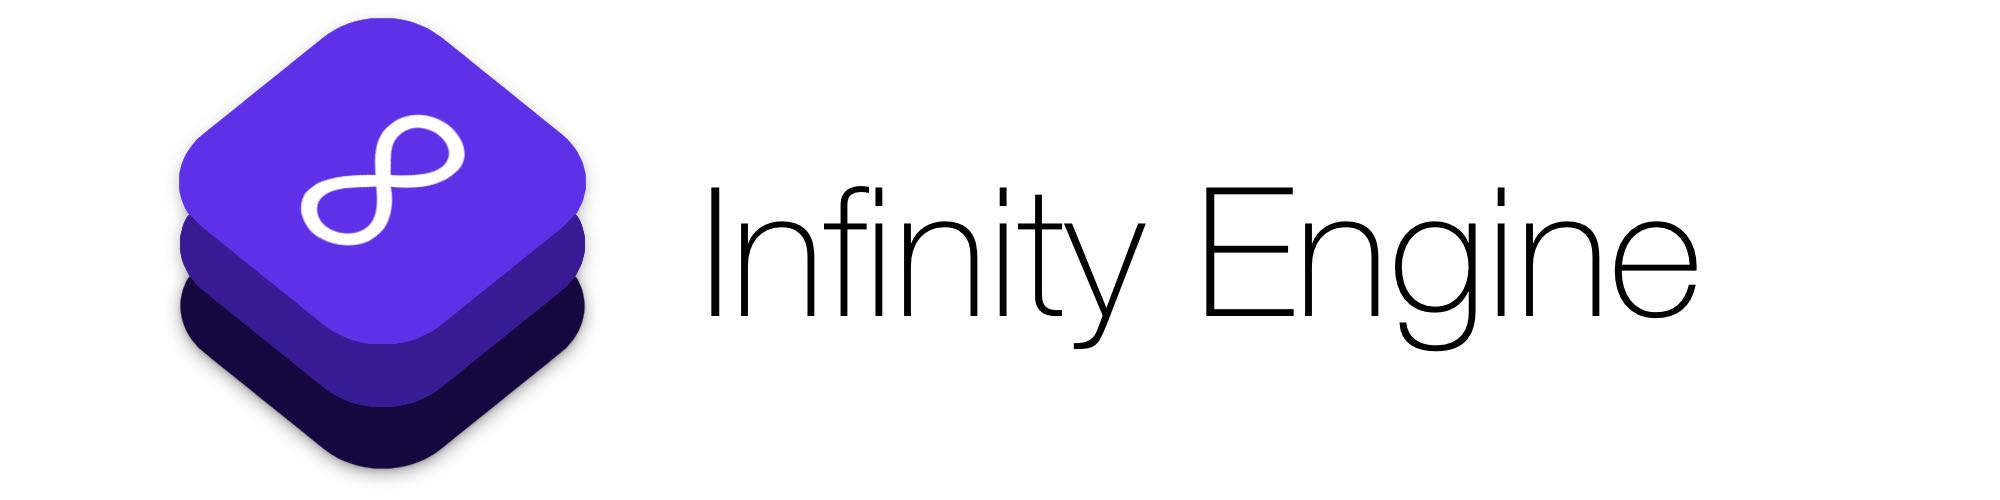 Infinity Engine Logo